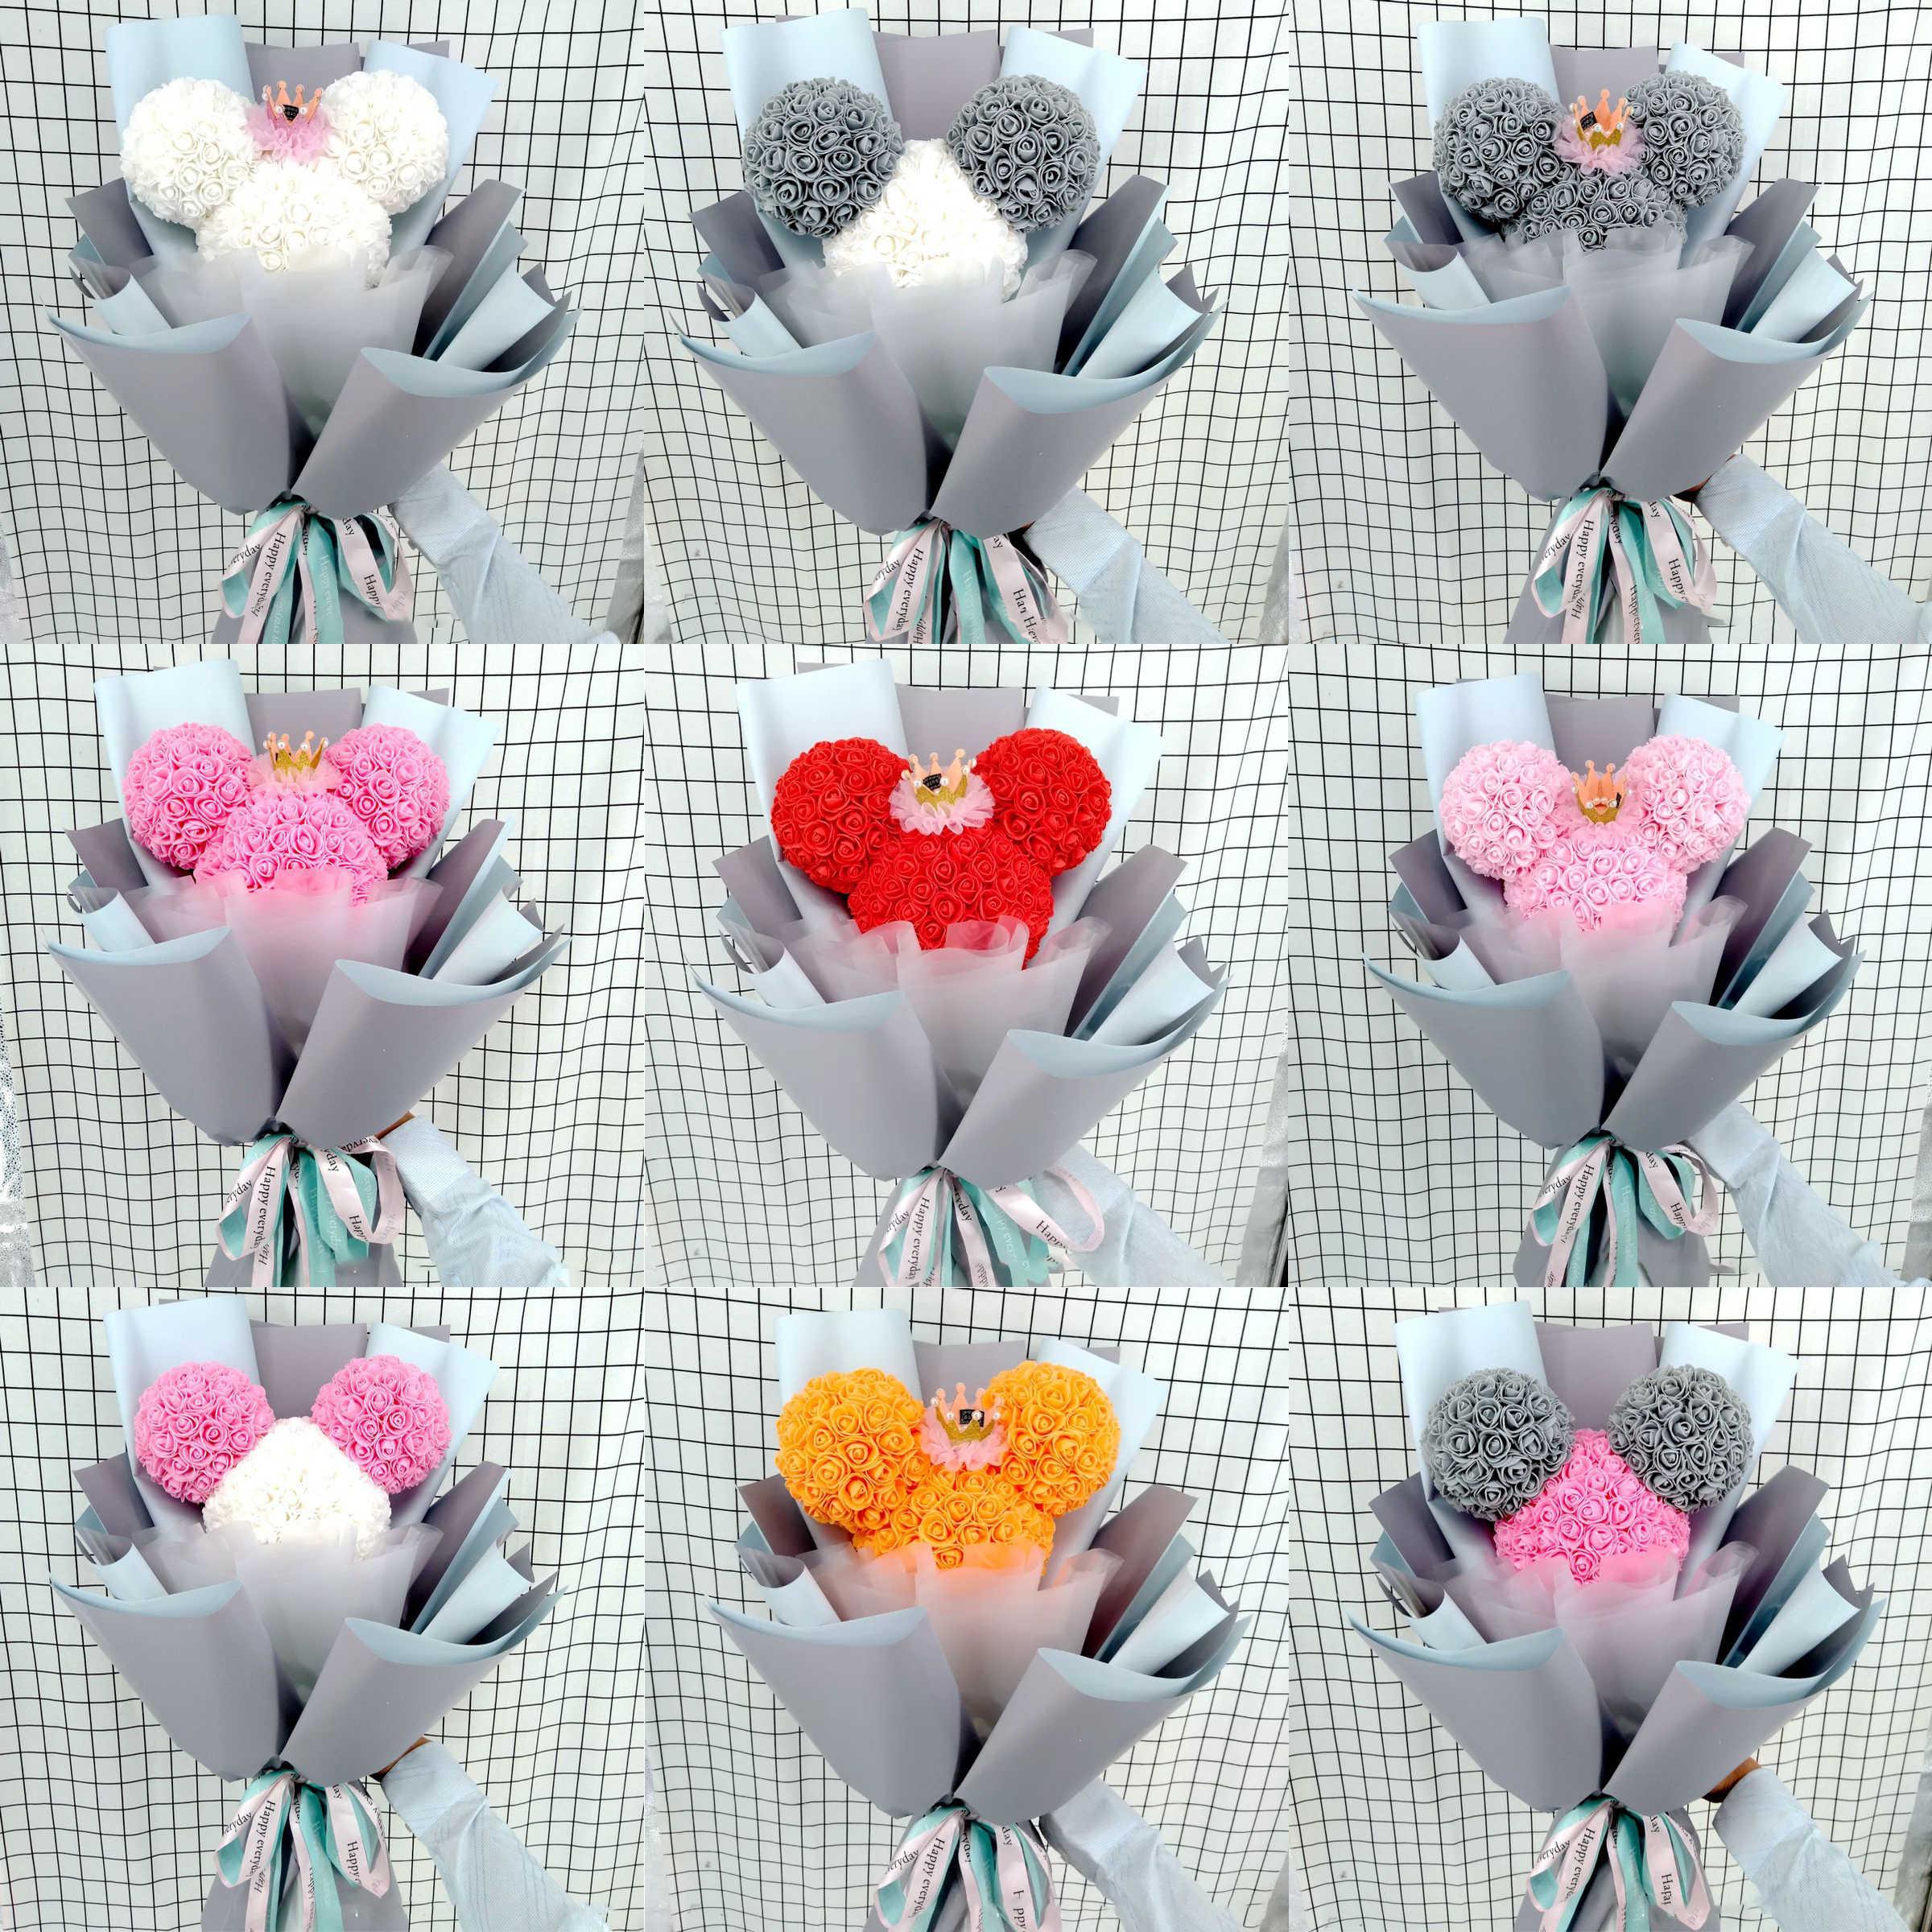 Decoración de boda Día de San Valentín regalo poliestireno espuma Oso Blanco jabón flor Mickey cabeza para decoración de fiesta DIY